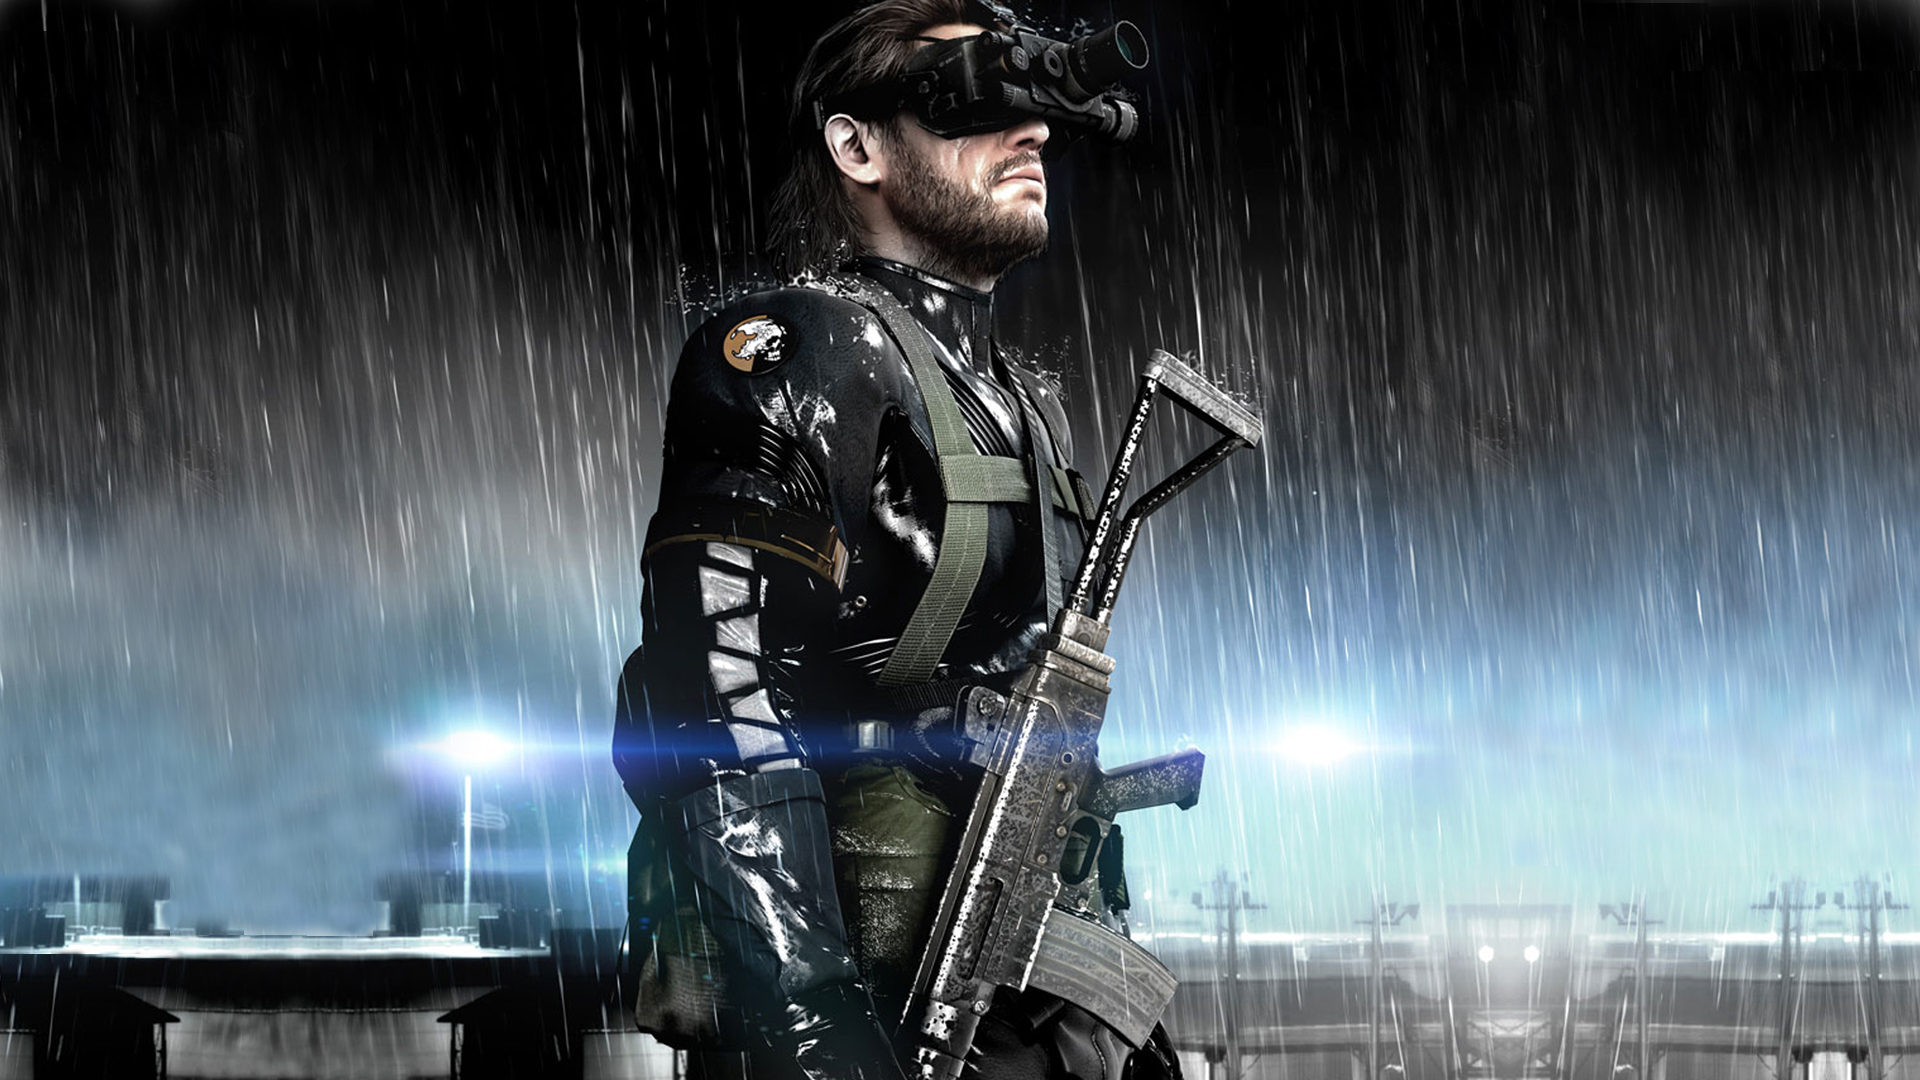 Metal Gear era la única franquicia fuerte que le quedaba a Konami antes de que se anunciara Silent Hills